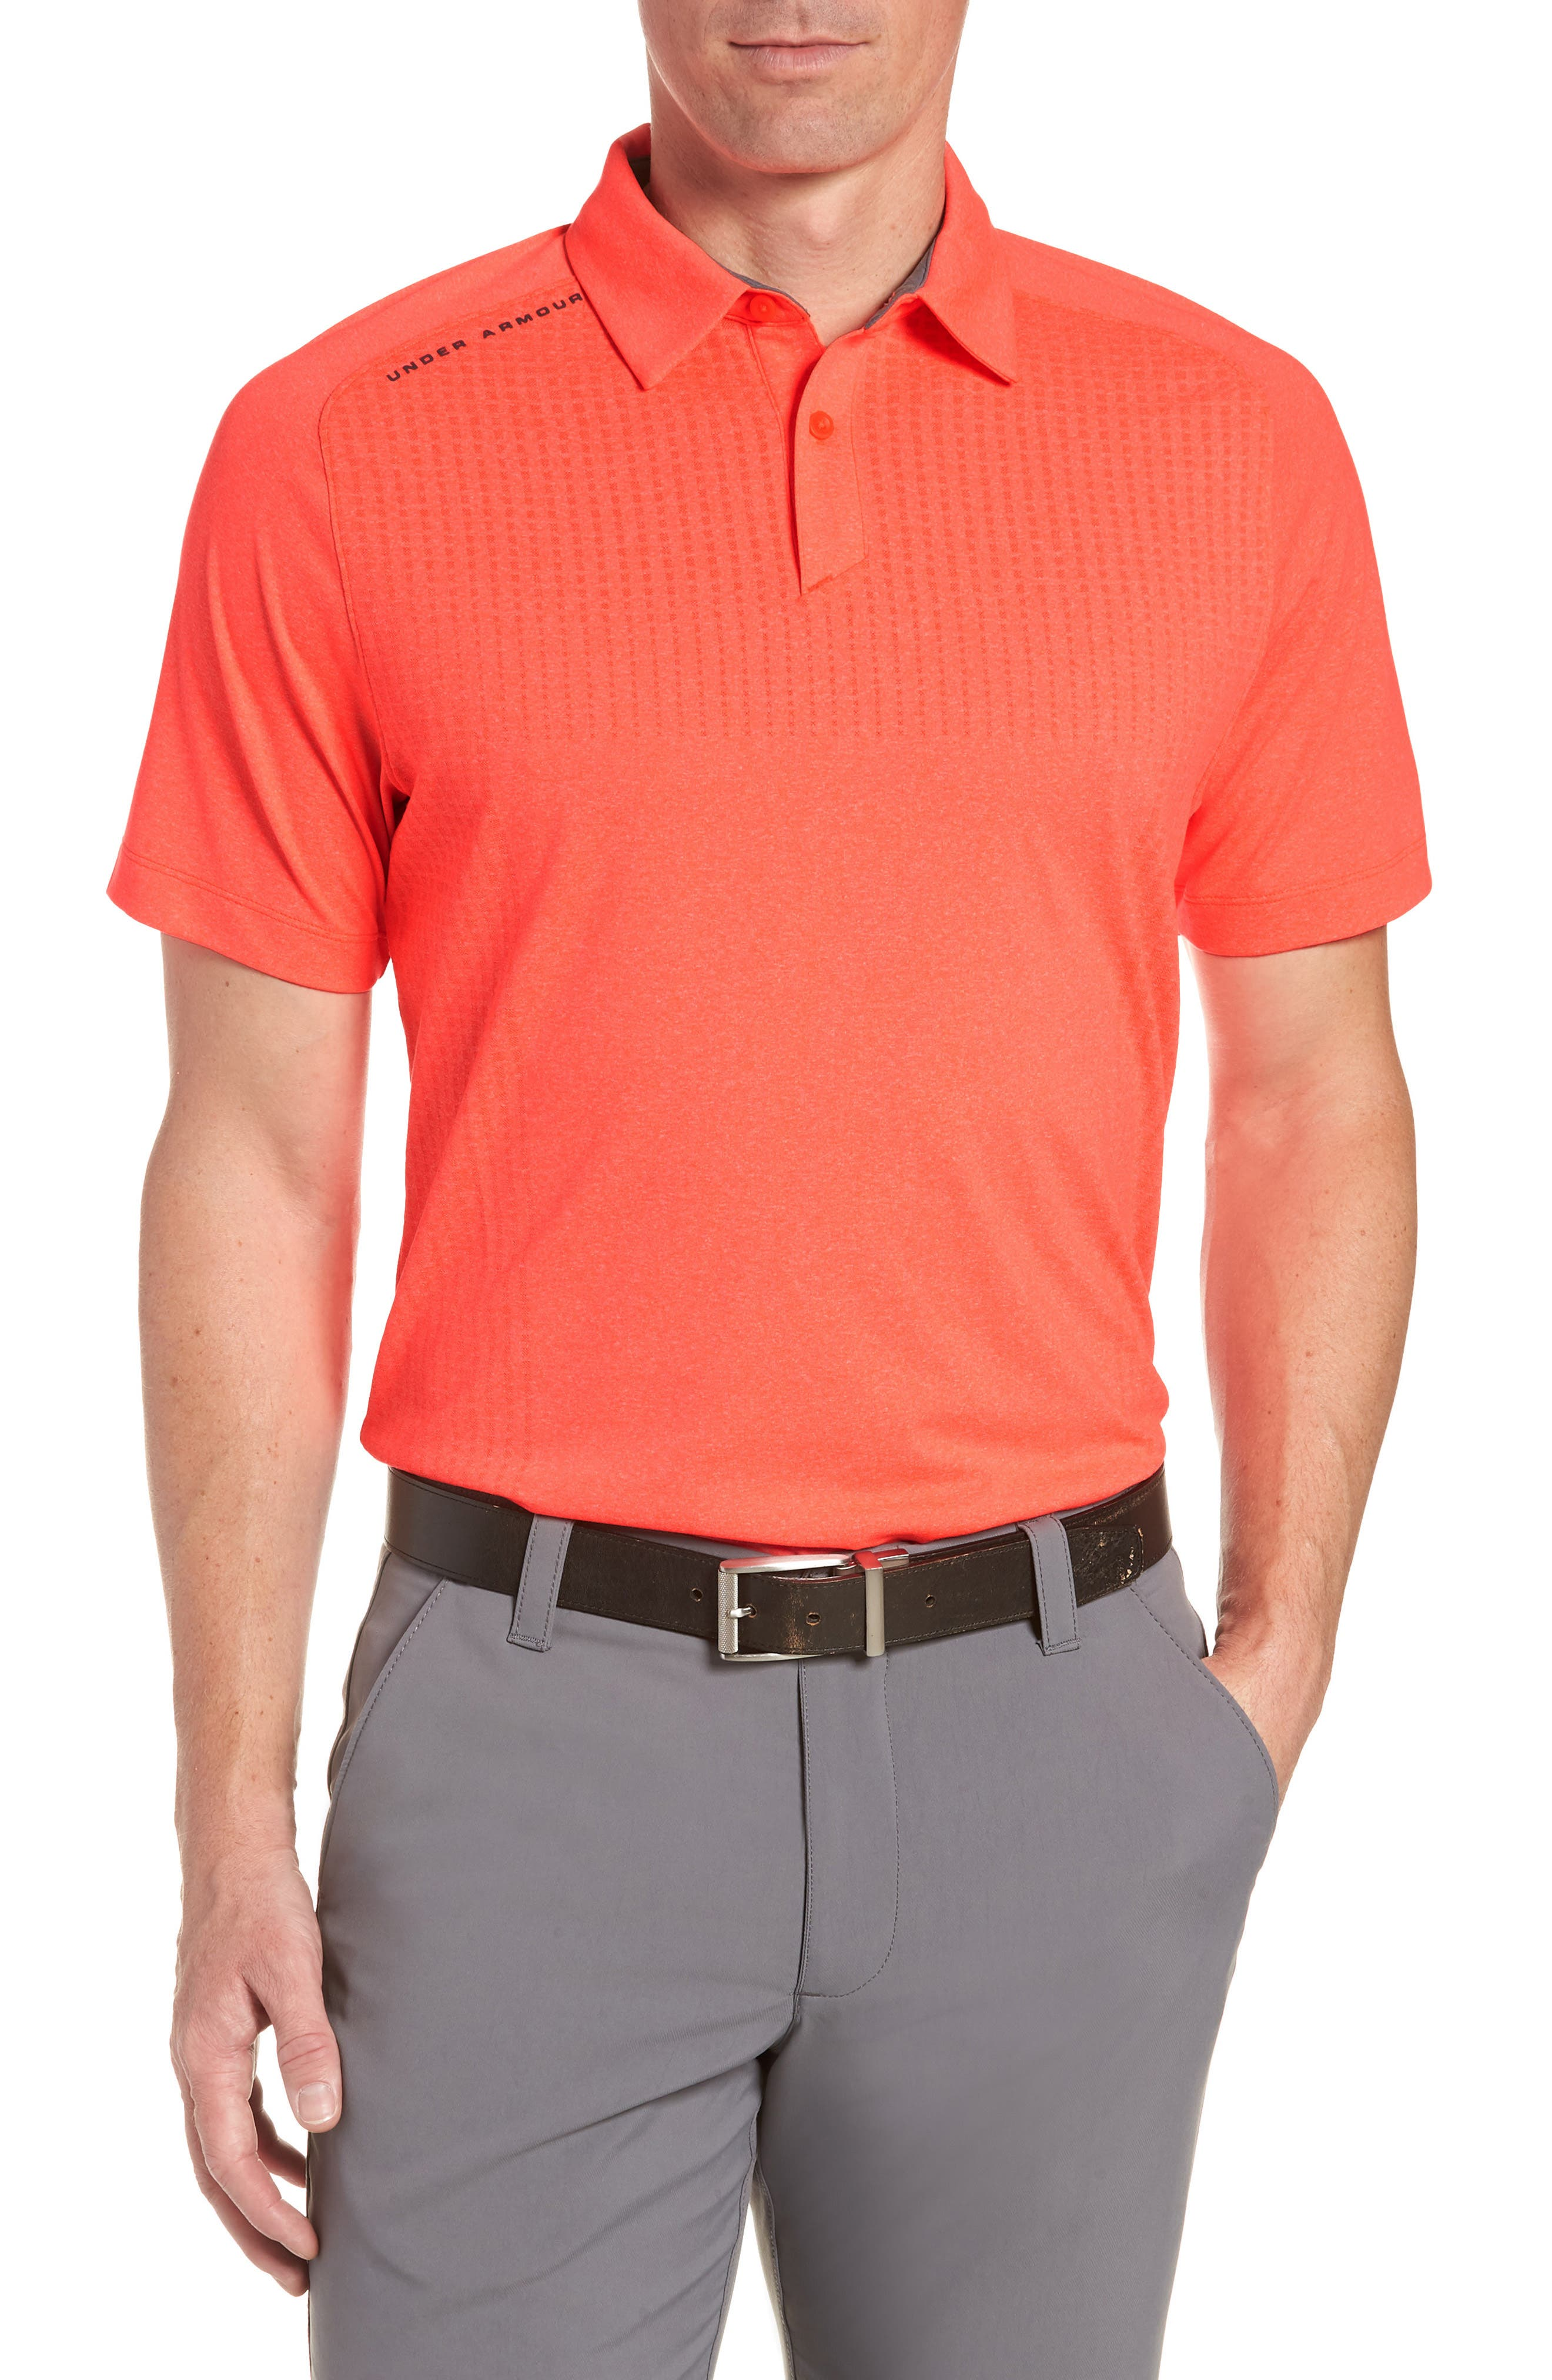 Threadborne Outer Glow Regular Fit Polo Shirt,                         Main,                         color, 986 Nen Crl Lght Hthr Rno Gry